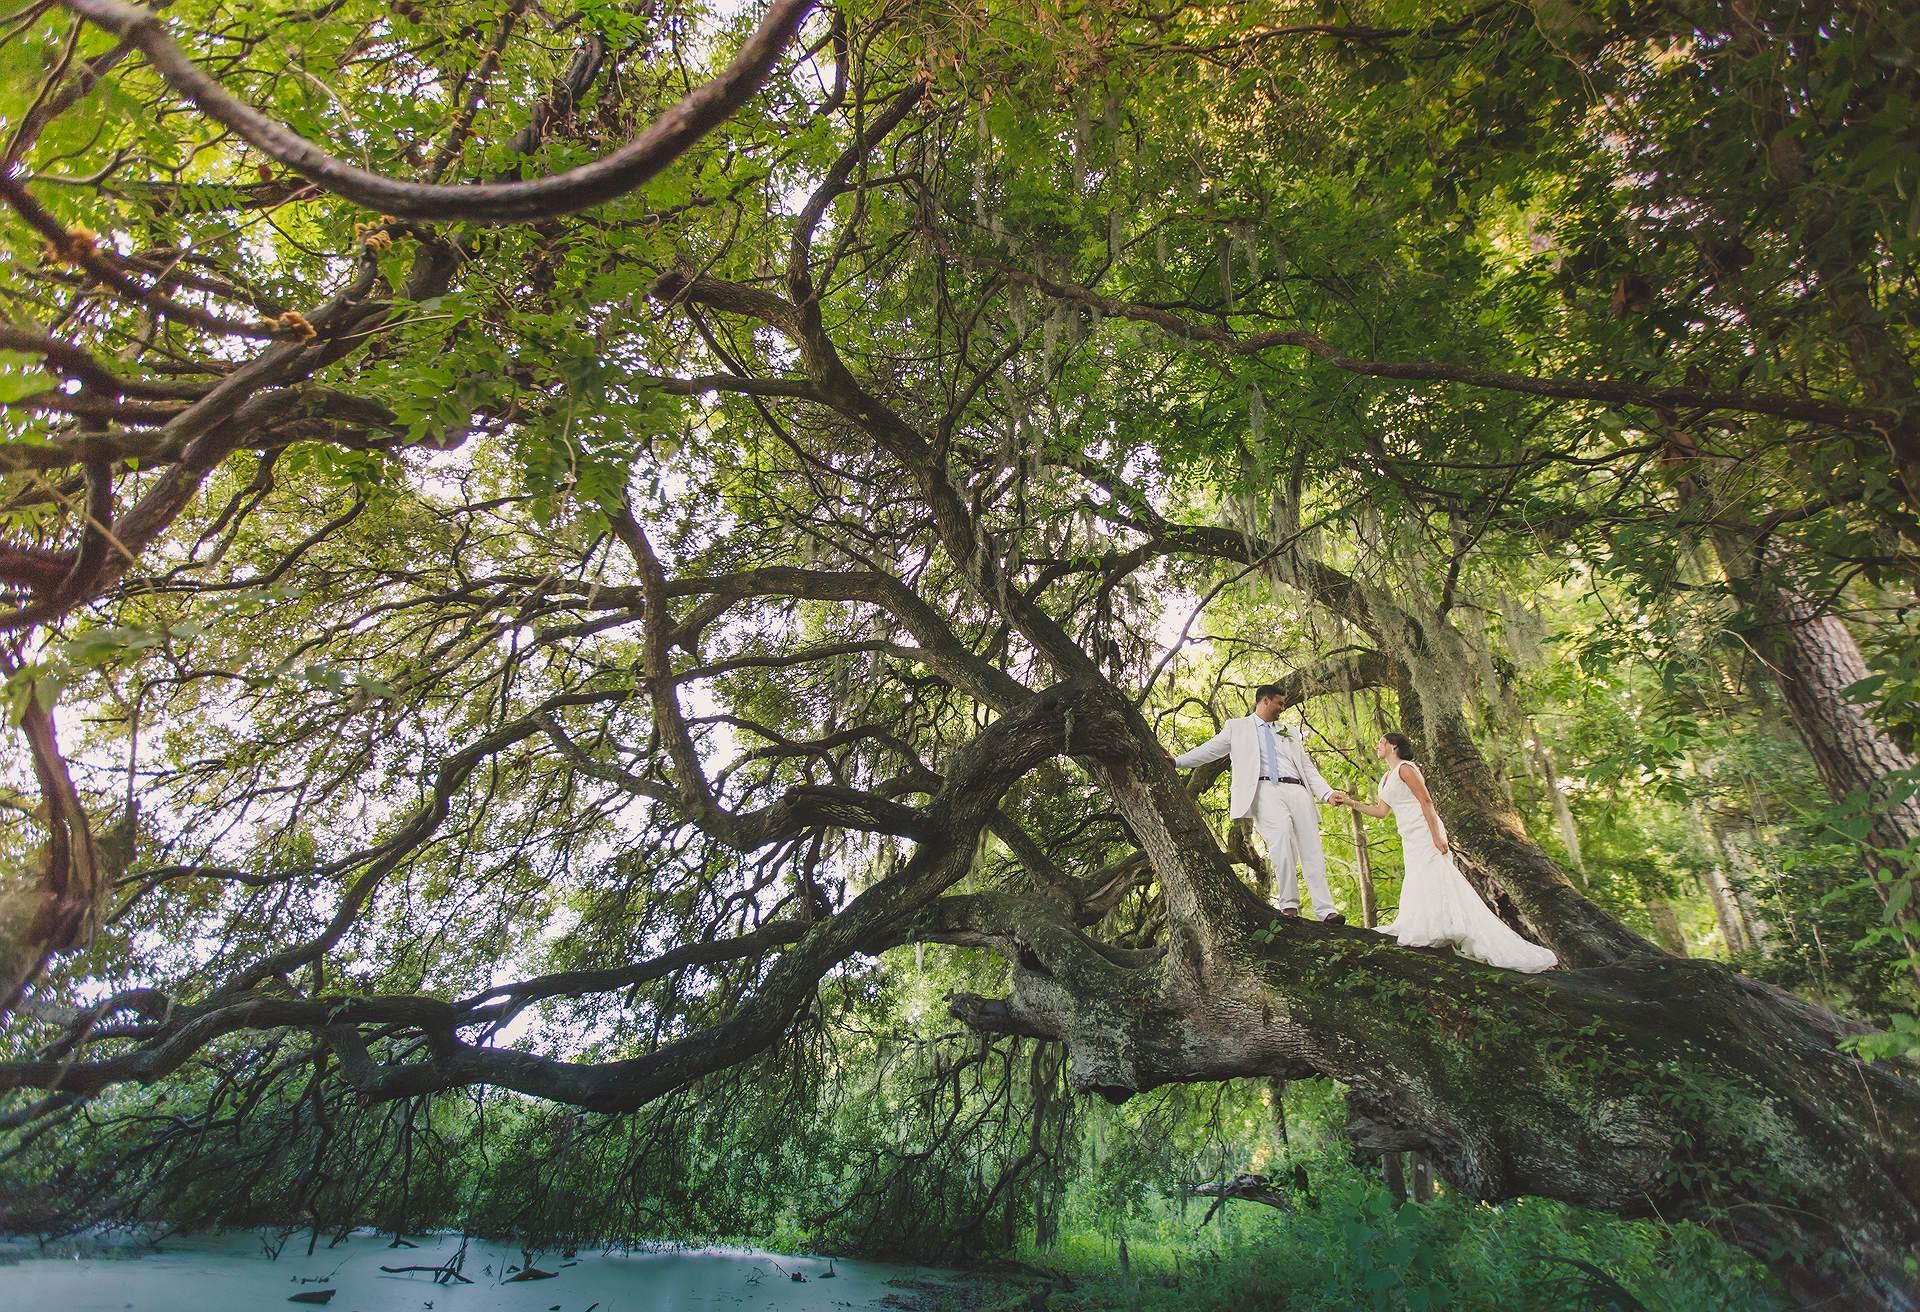 Over the river at Magnolia Plantation